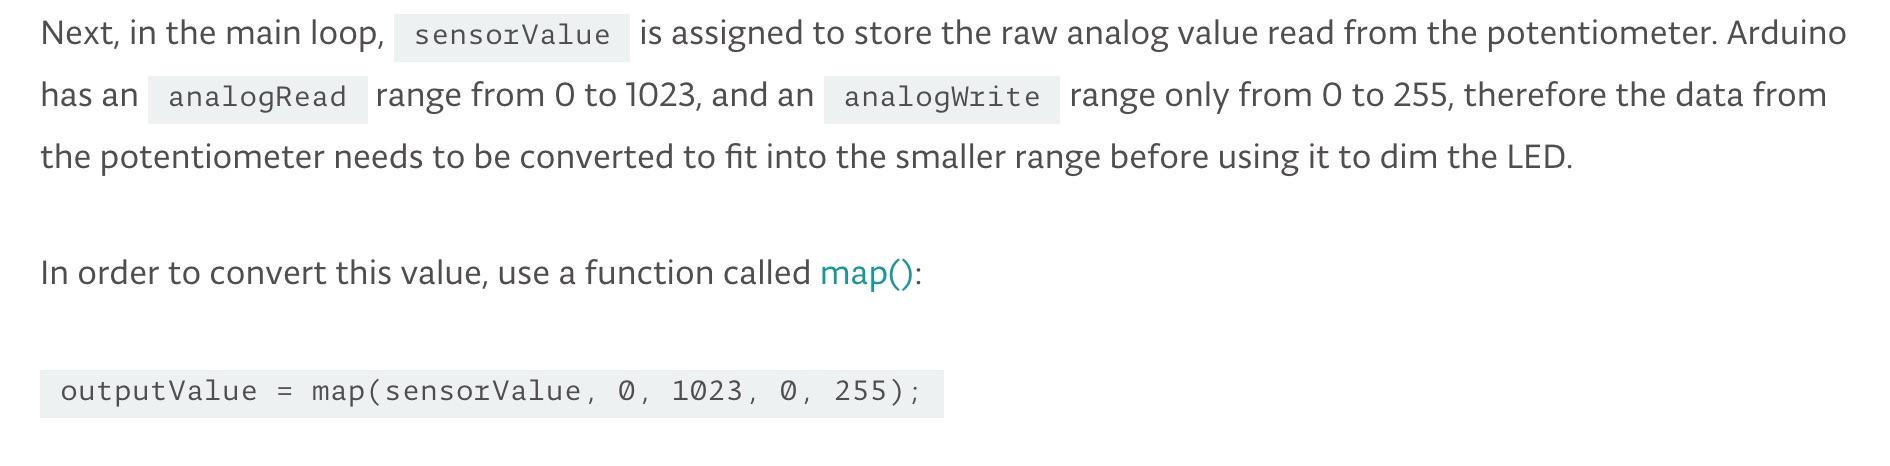 W5_Using map() function.jpg